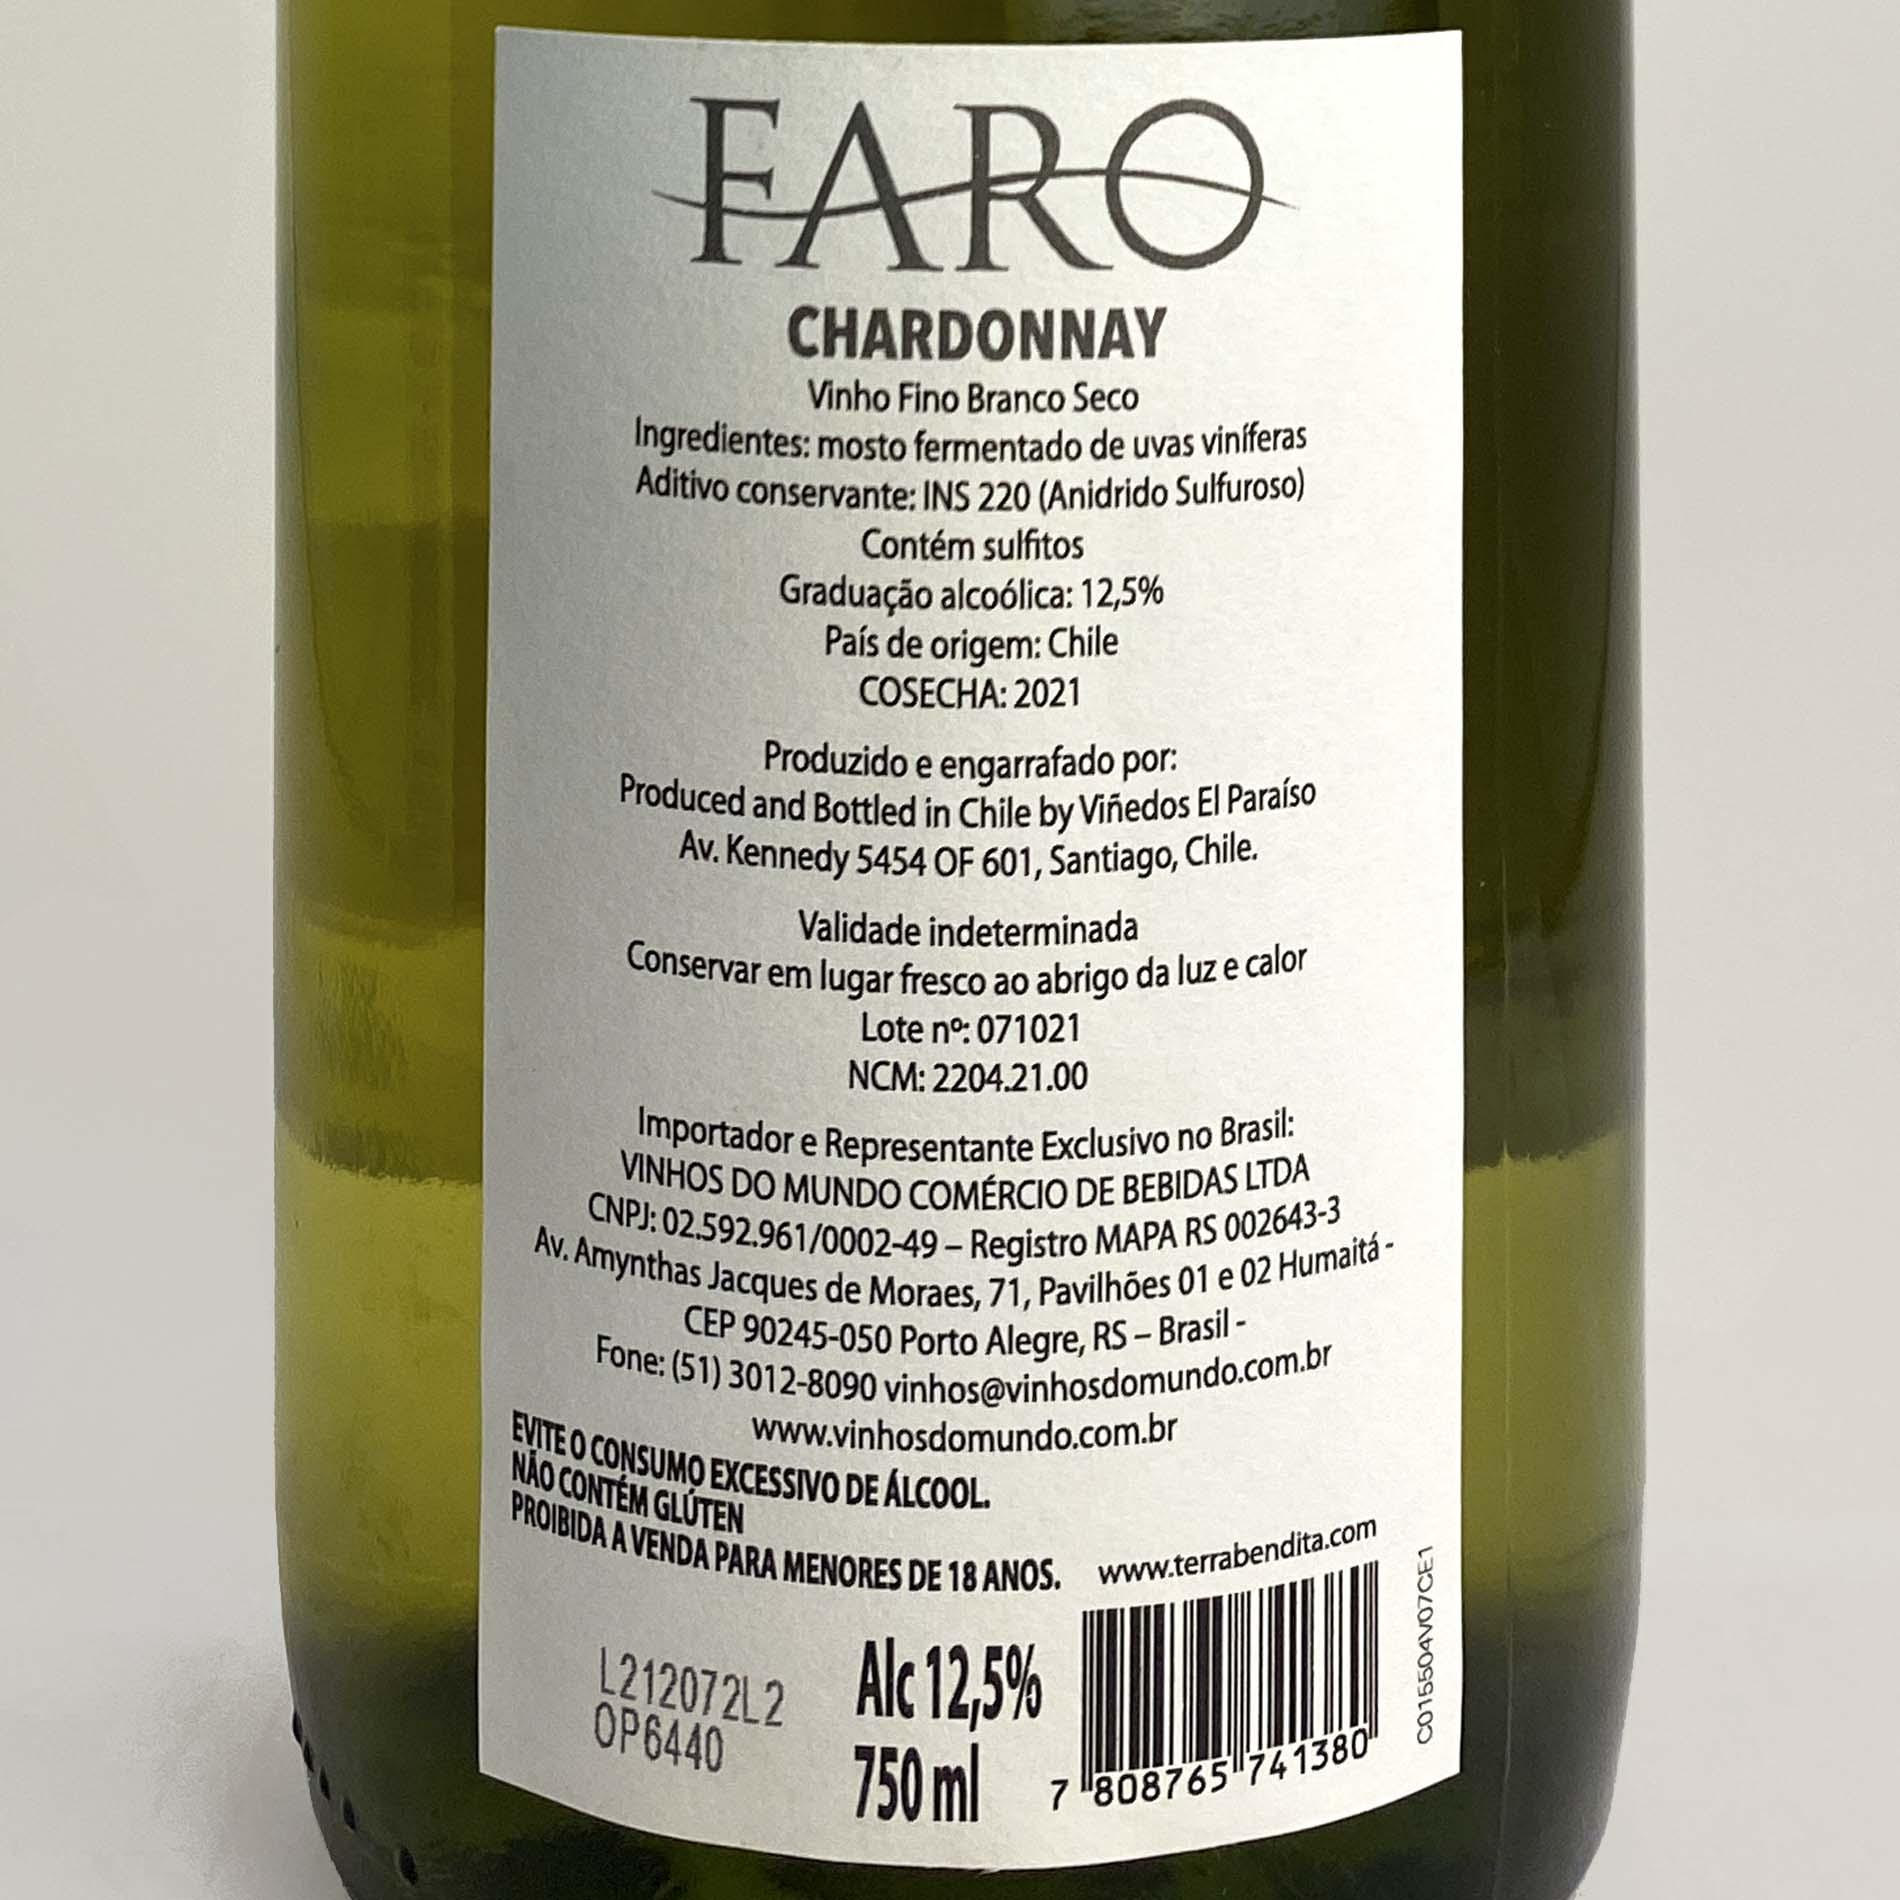 Faro Chardonnay (Chileno)  - Vinerize